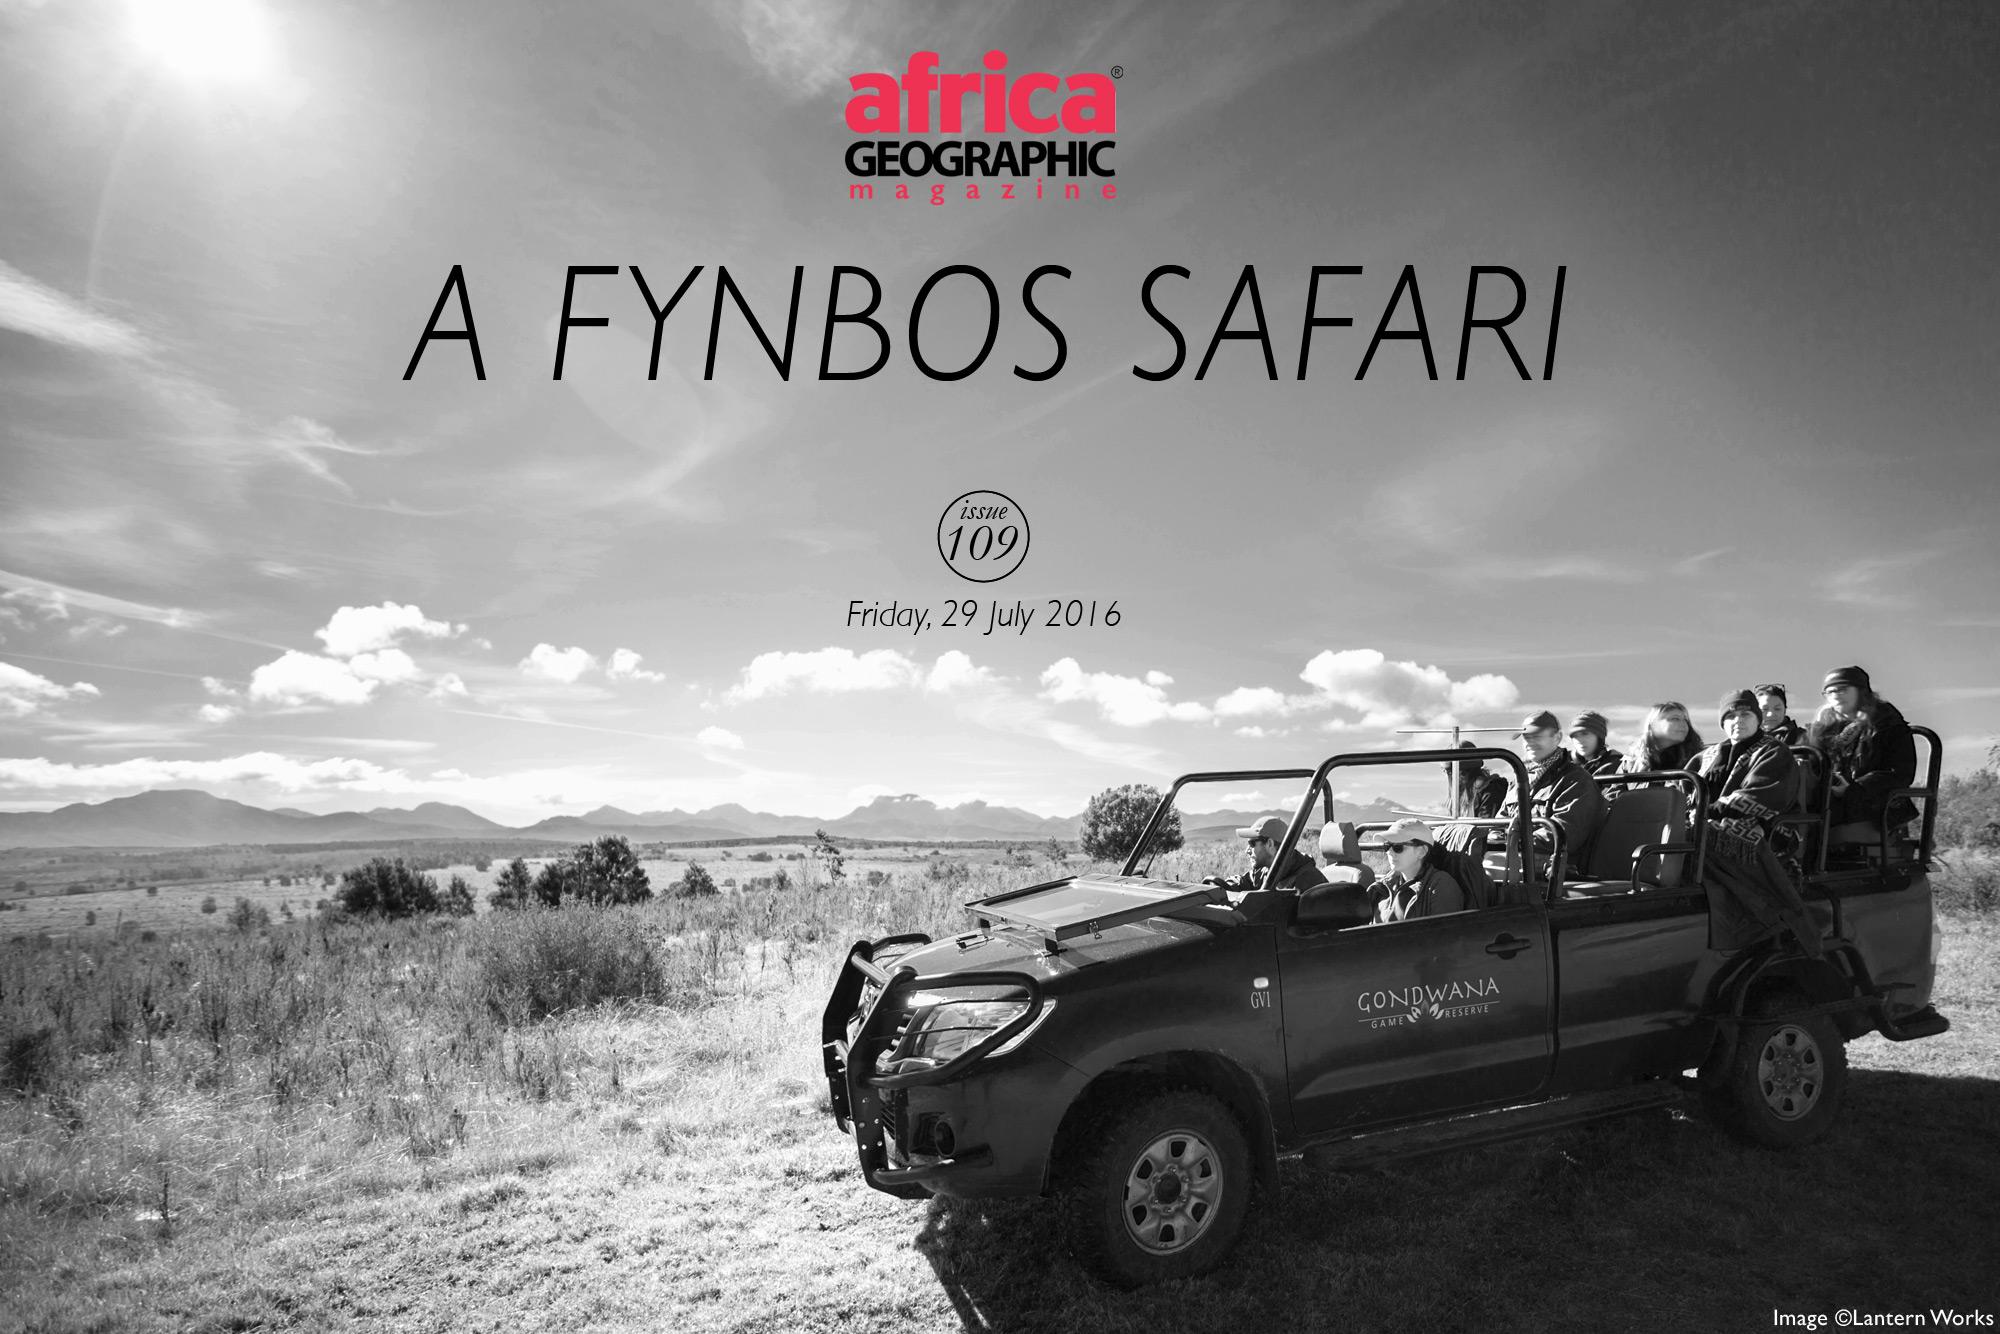 africa-geographic-a-fynbos-safari